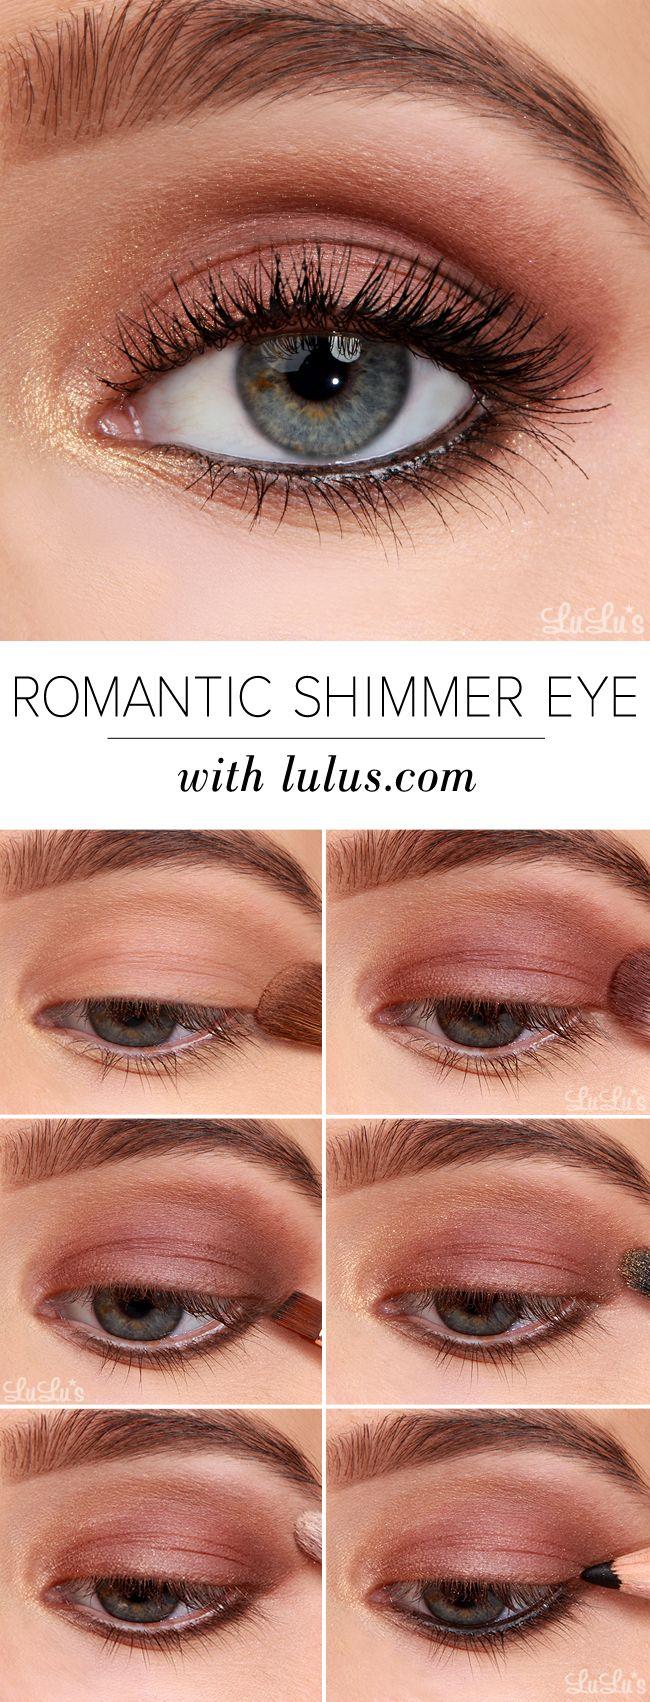 How-To: Romantic Shimmer Eyeshadow Tutorial #makeup #eyeshadow